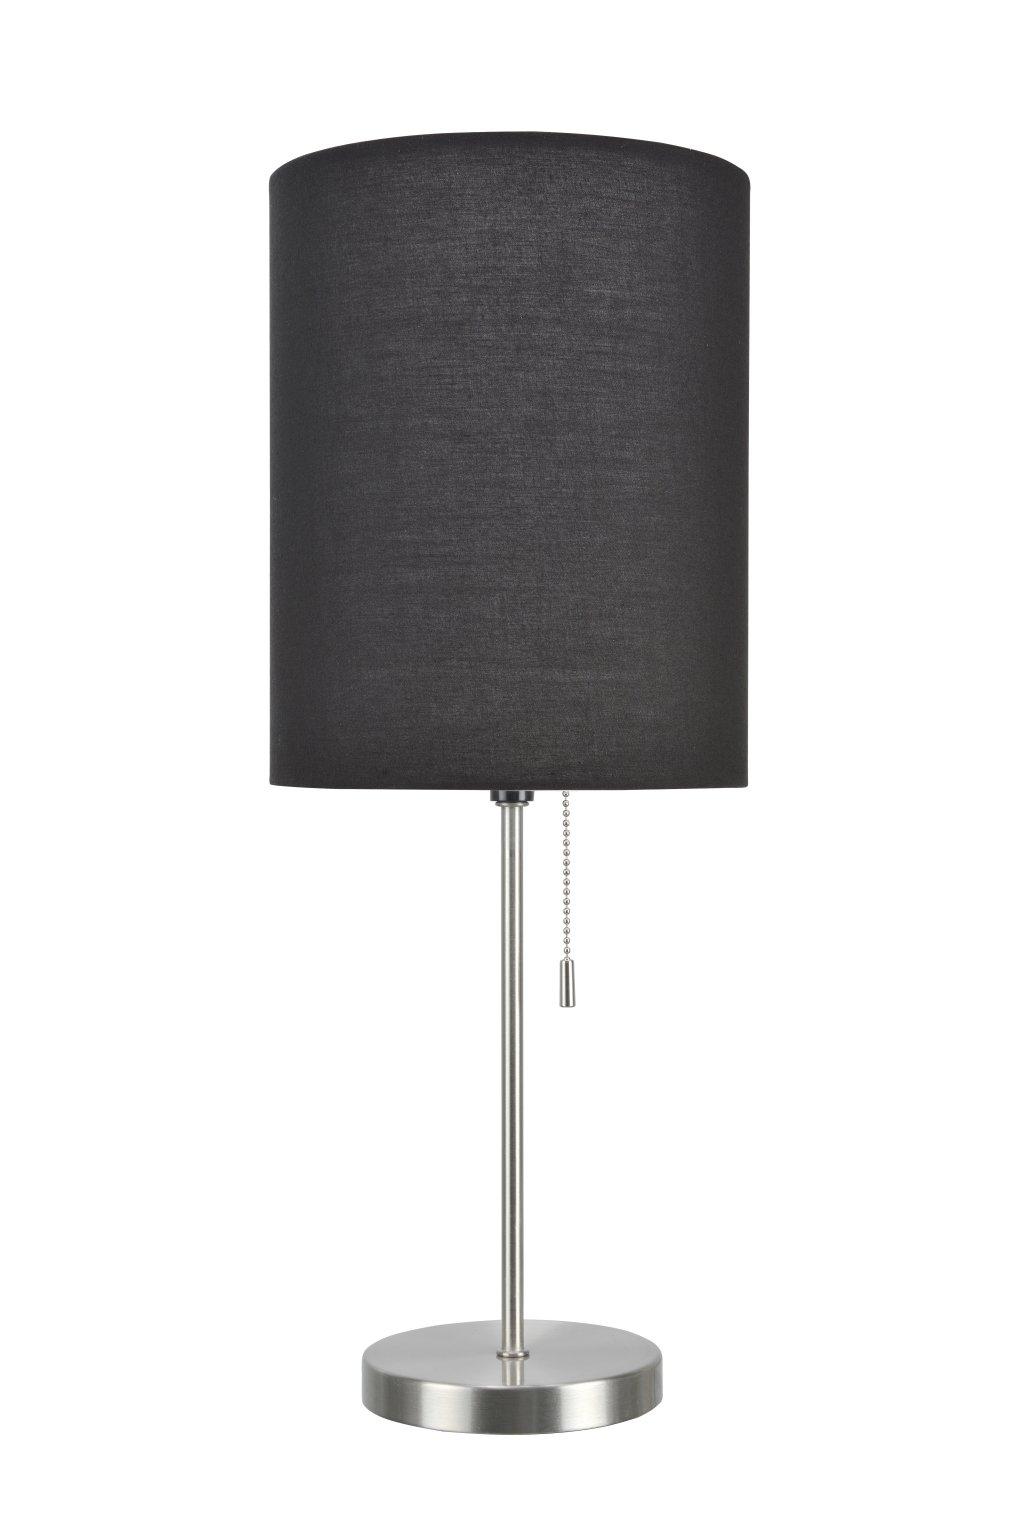 Aspen Creative 40083-3 1-Pack Set-1 Light Candlestick Table Lamp, Contemporary Design in Satin Nickel, 19 1/2'' High, Black